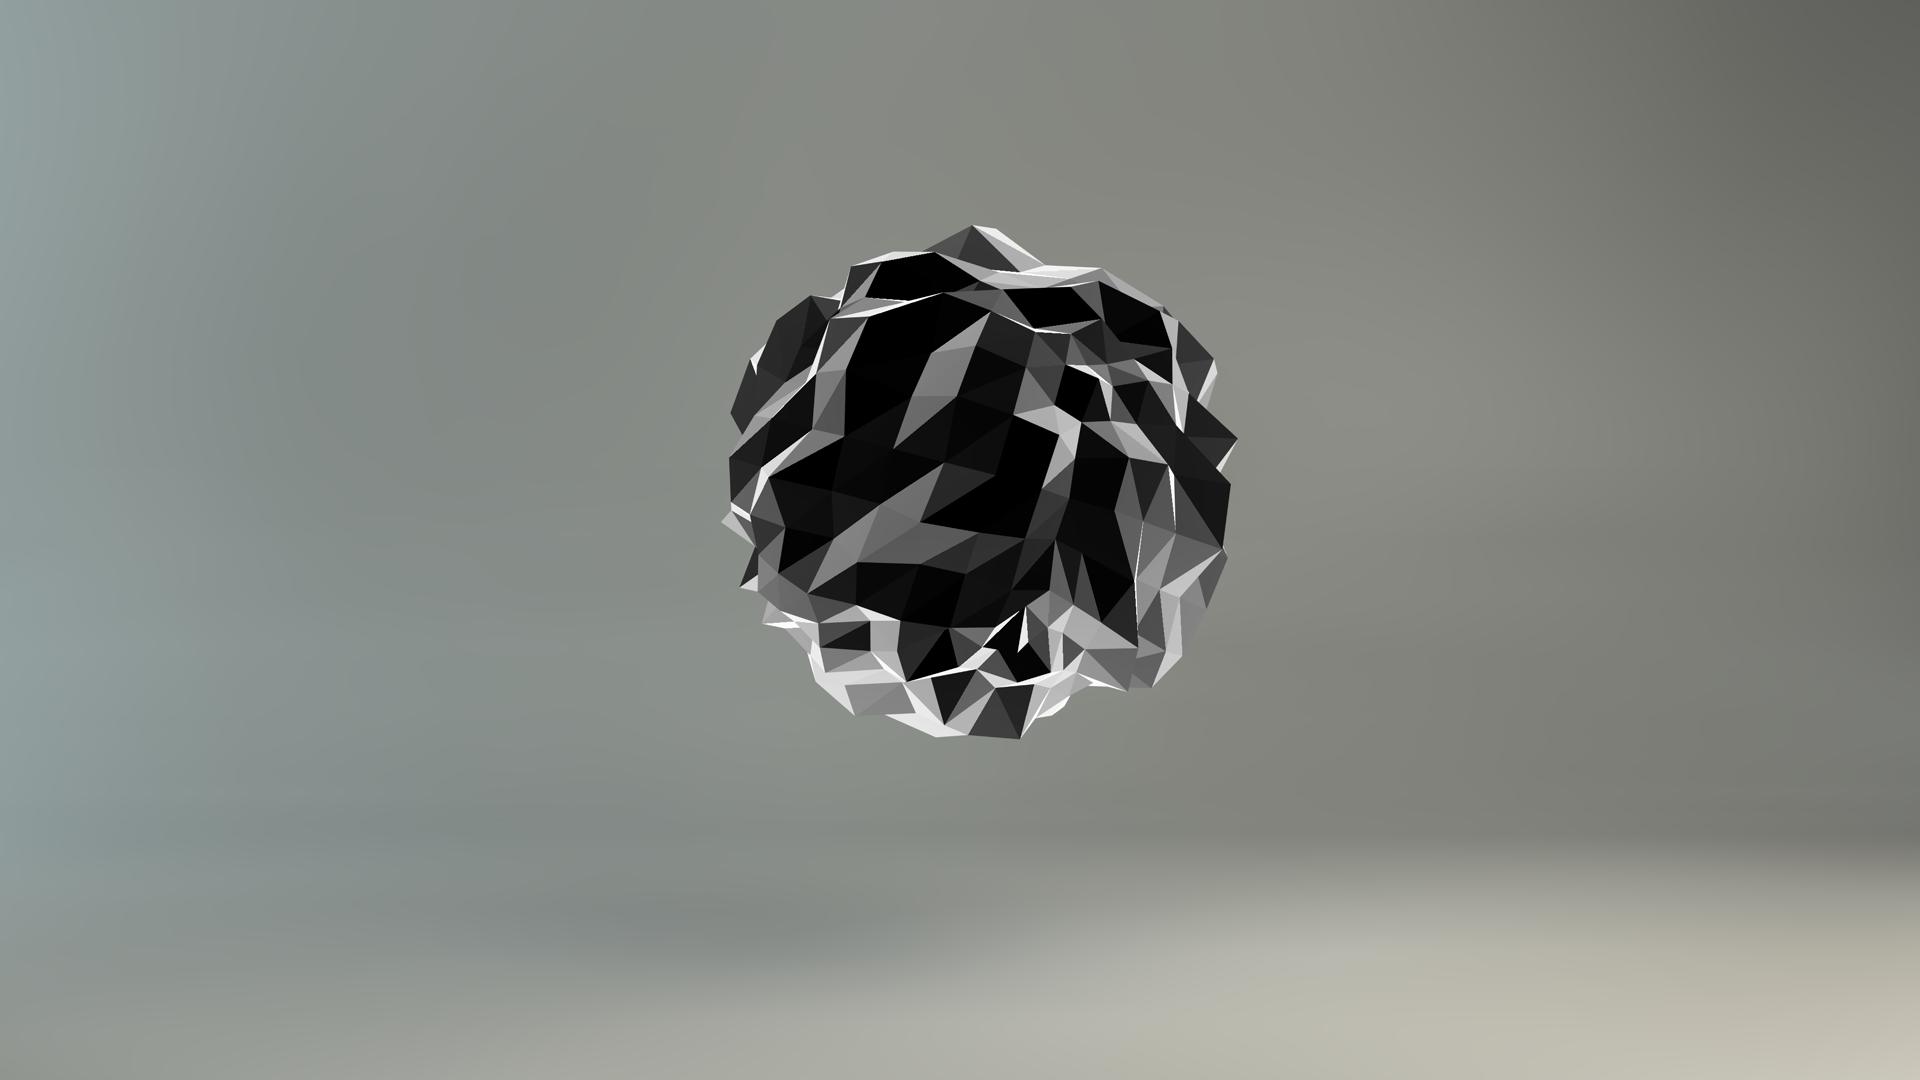 General 1920x1080 digital art minimalism gray background sphere low poly 3D geometry monochrome gradient abstract artwork render CGI